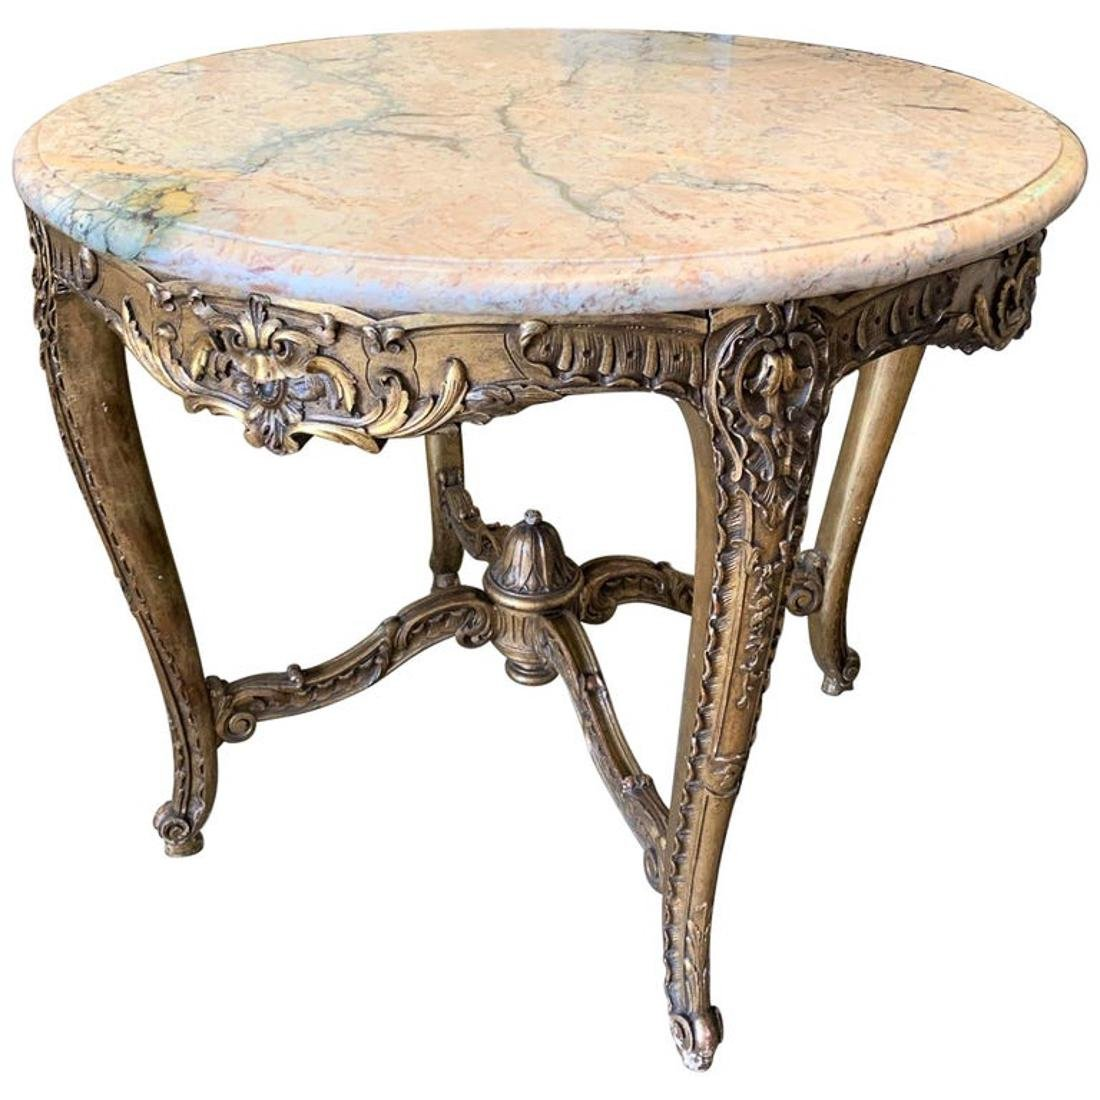 Giltwood Louis Xv Center Table